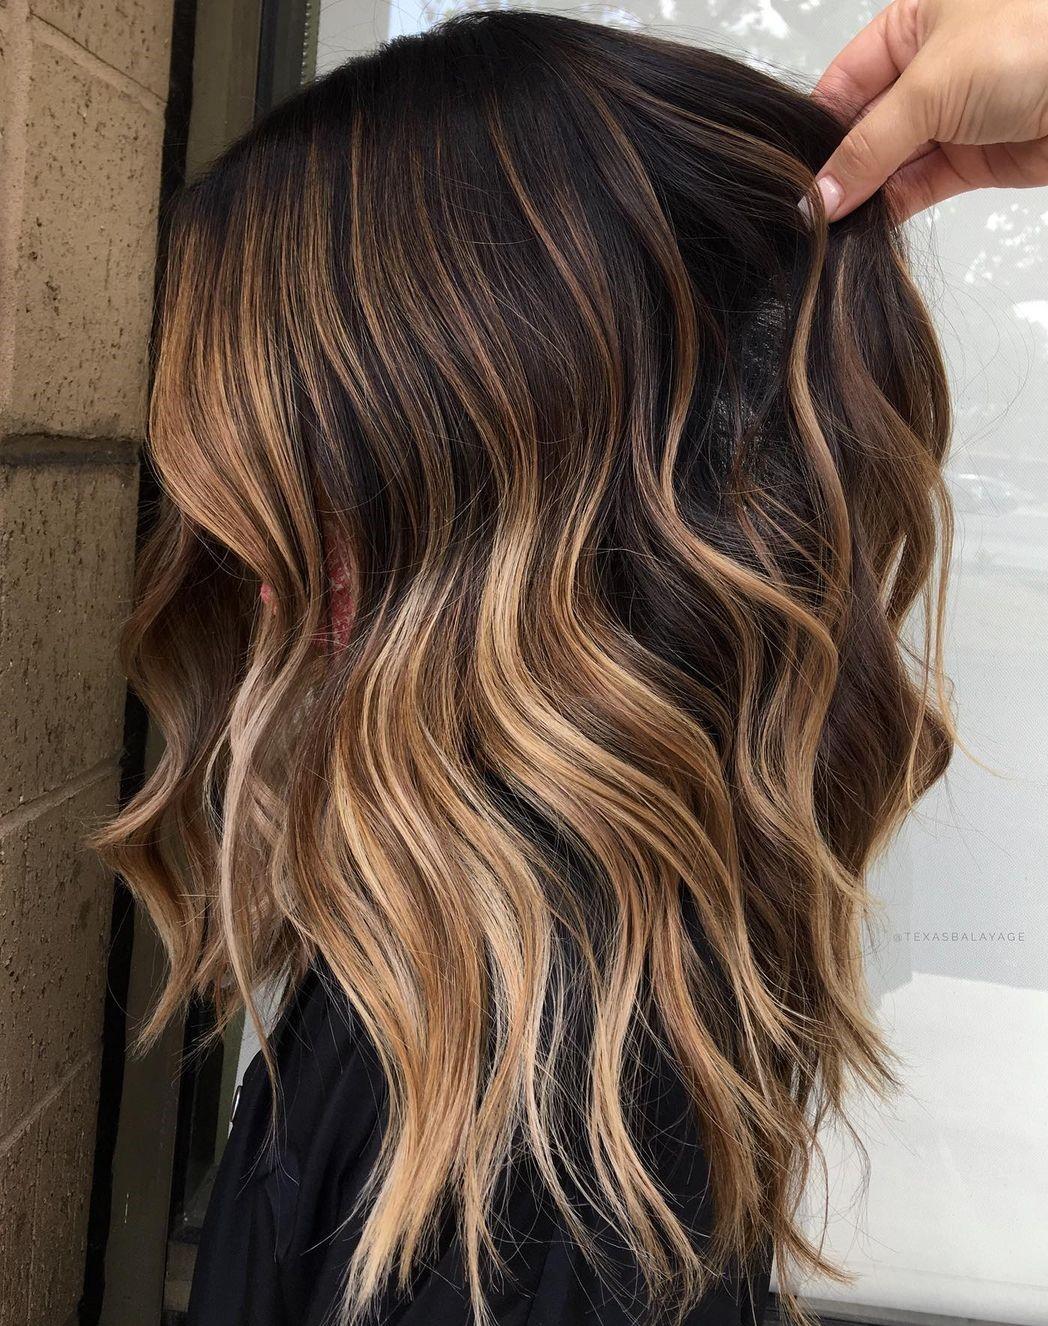 Golden Highlights for Dark Brown Hair